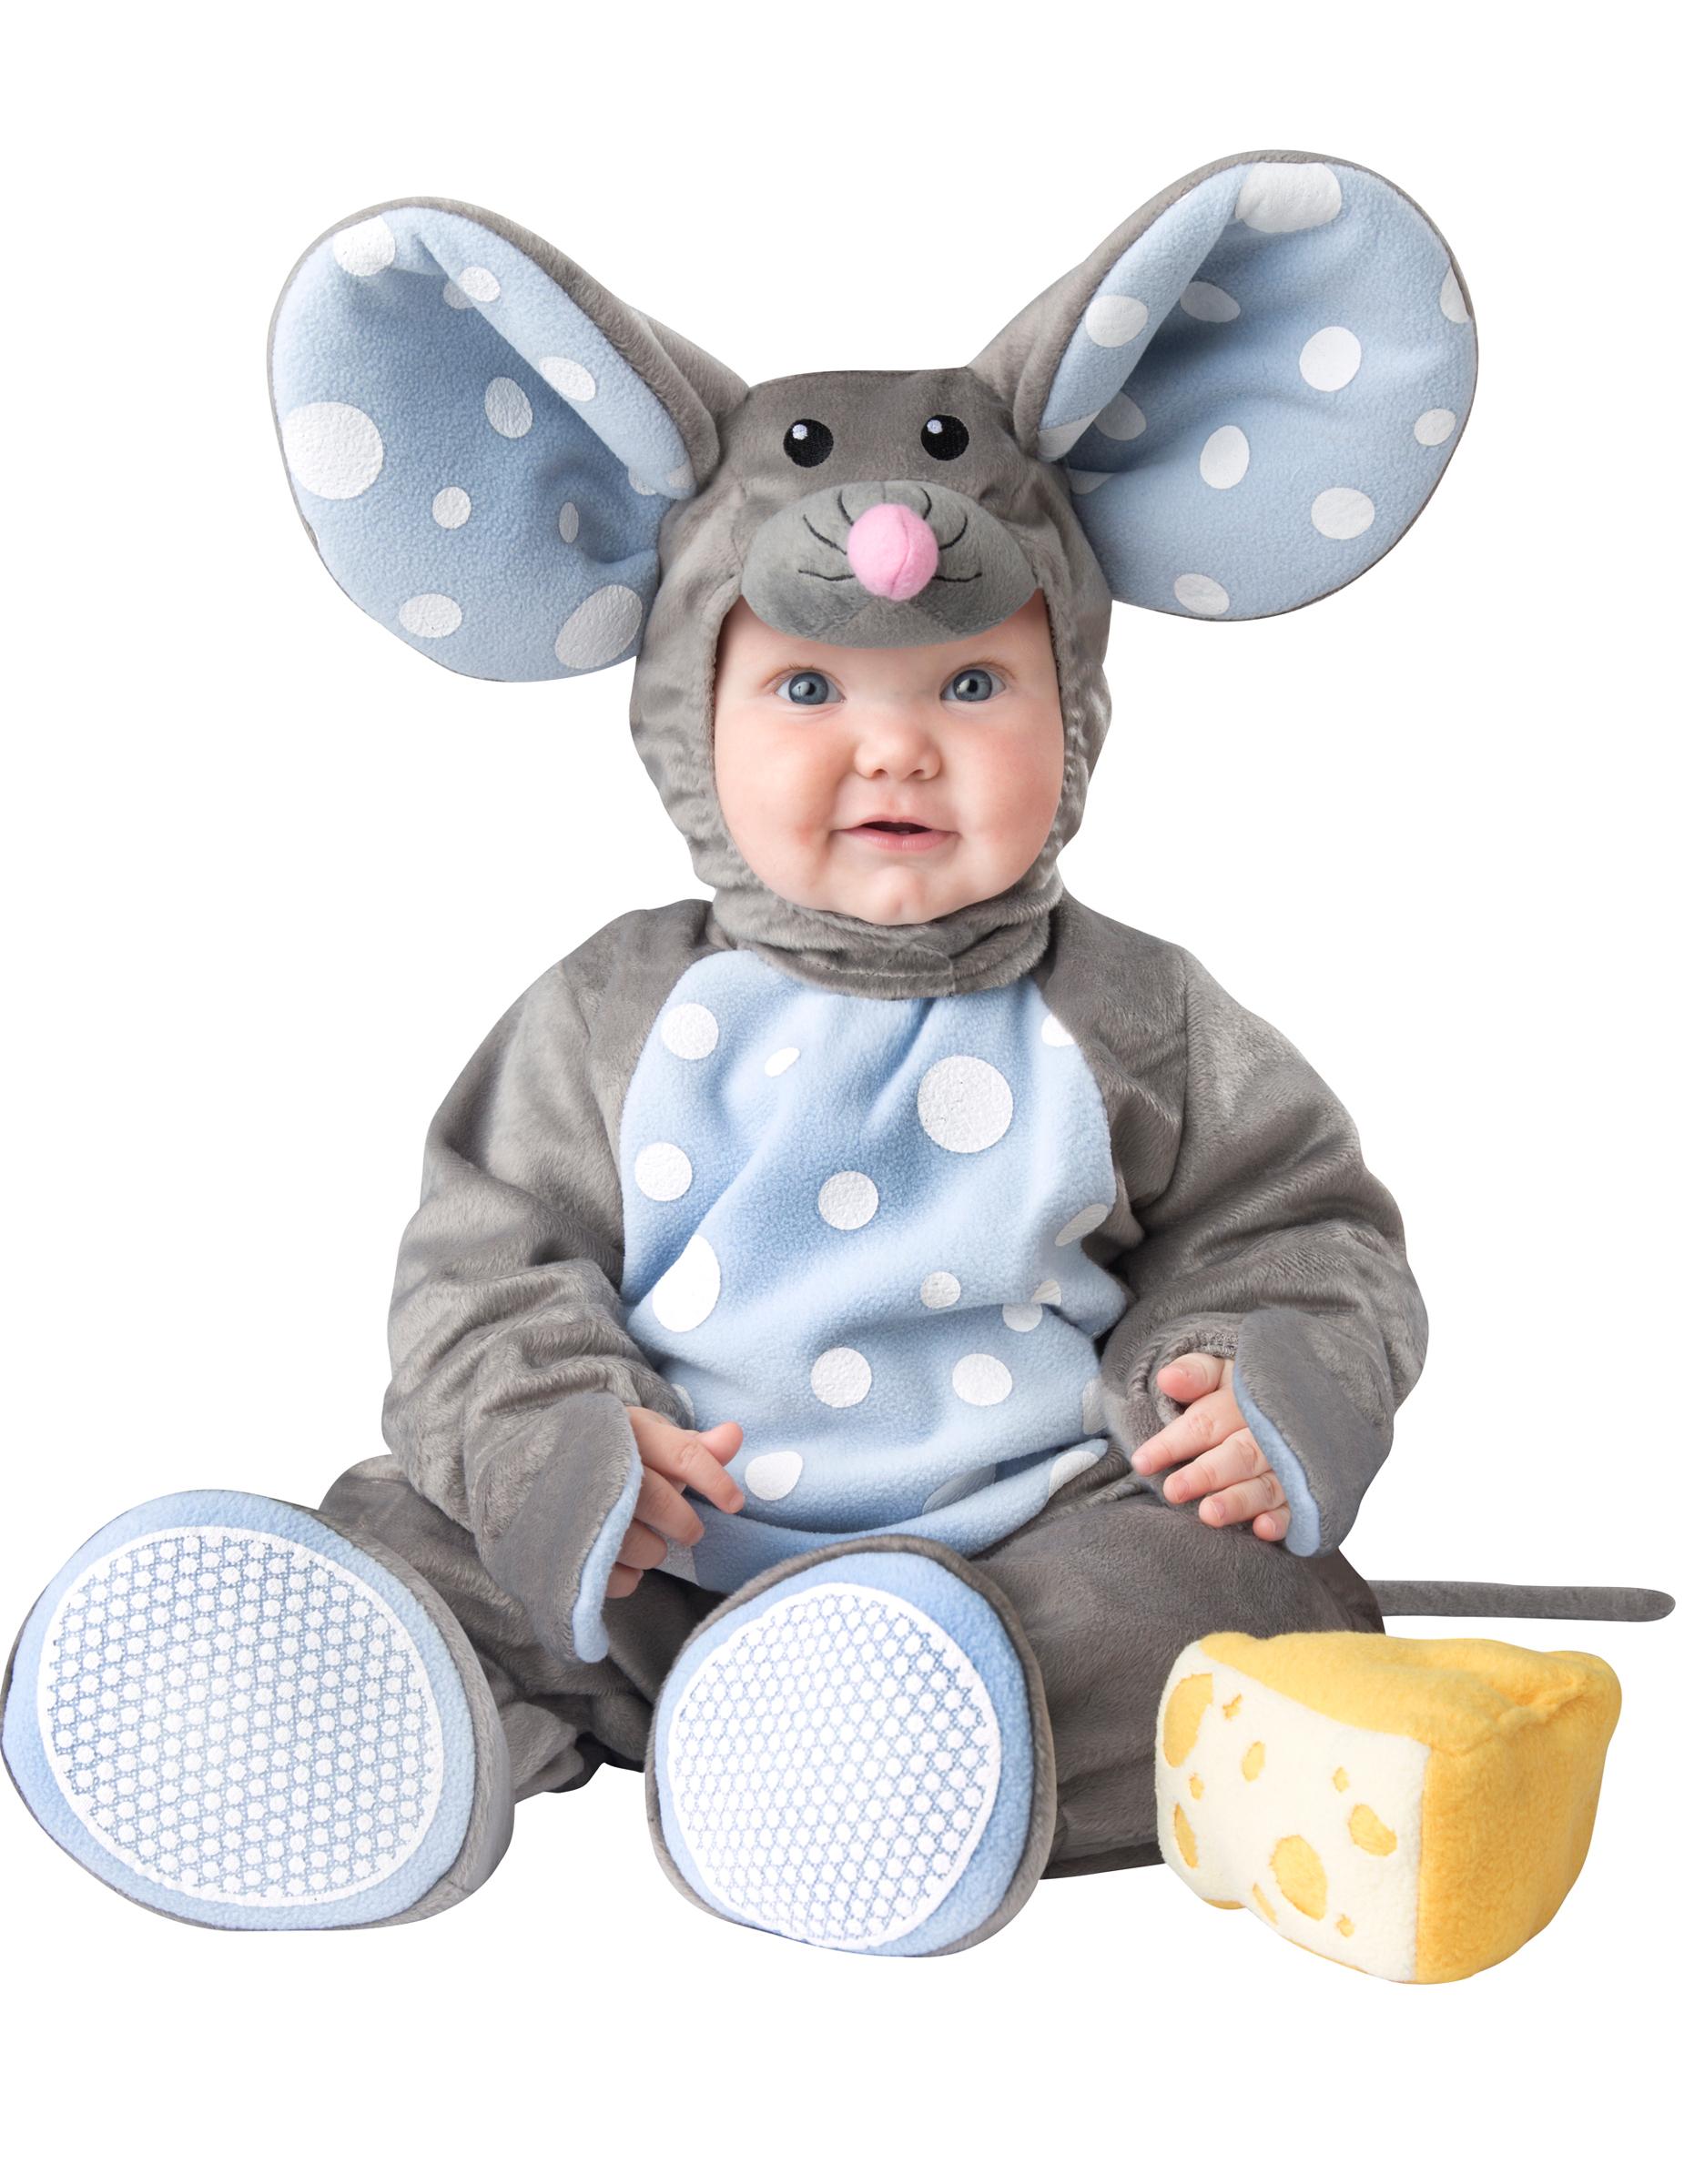 Disfarce de rato para bebé - Luxo  Disfarces Crianças 3cf0b8377f2